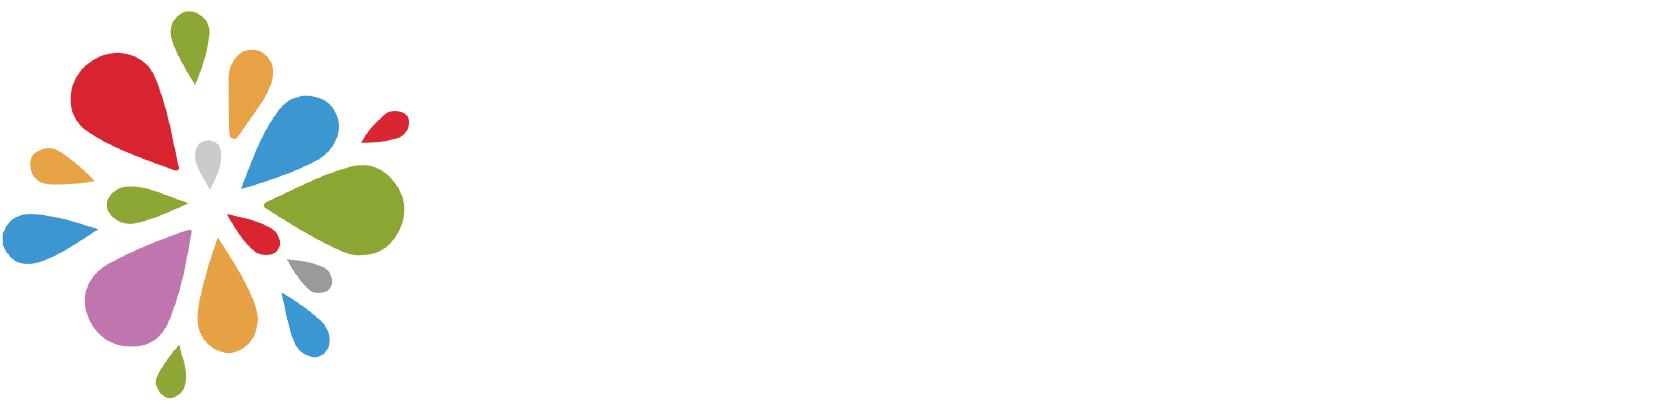 Majadahonda - Noticias - Centros Comerciales  - Ofertas - Empresas